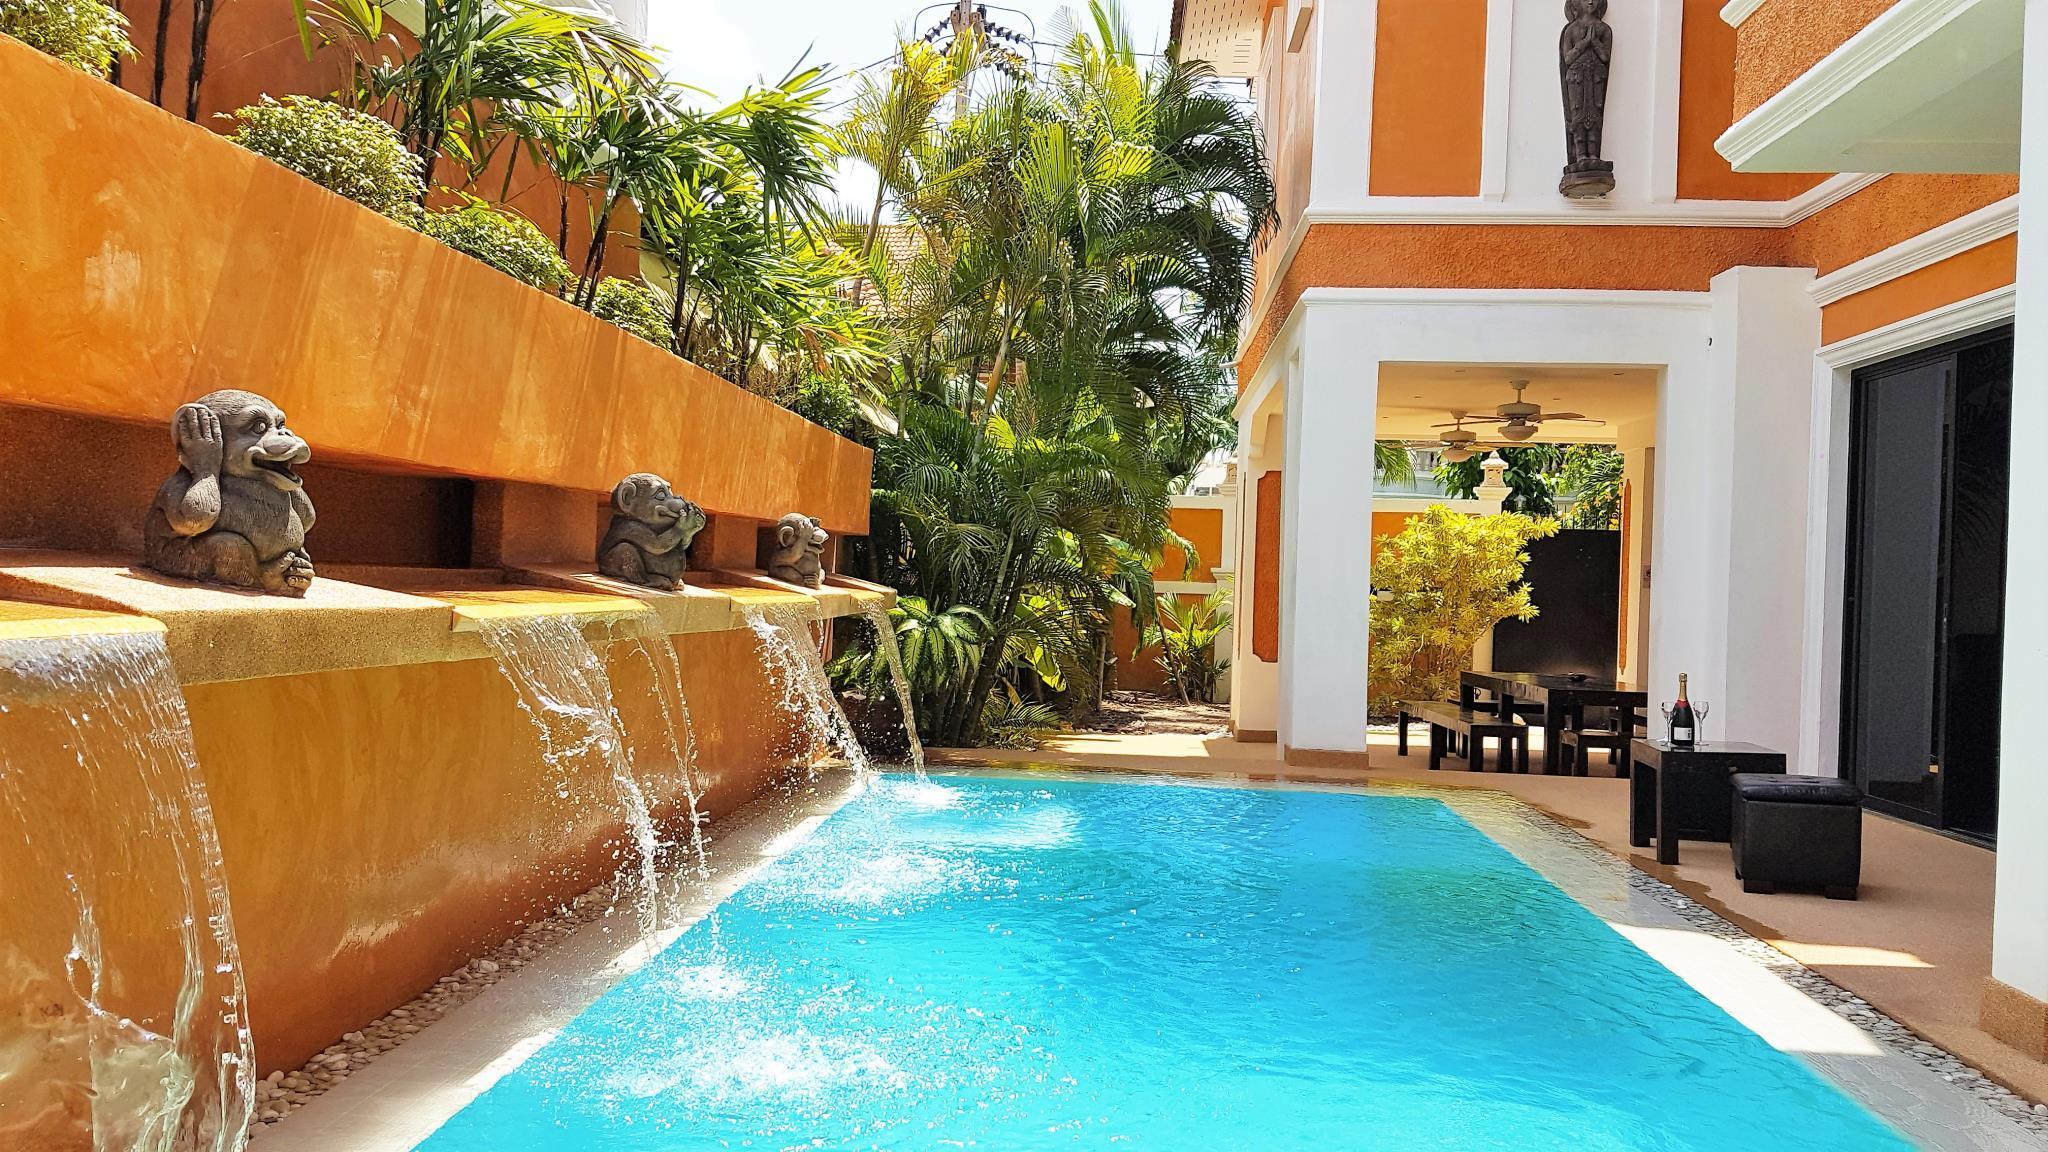 HIDELAND - The Luxury Tropical Villa  Pool Jacuzzi,HIDELAND - The Luxury Tropical Villa  Pool Jacuzzi